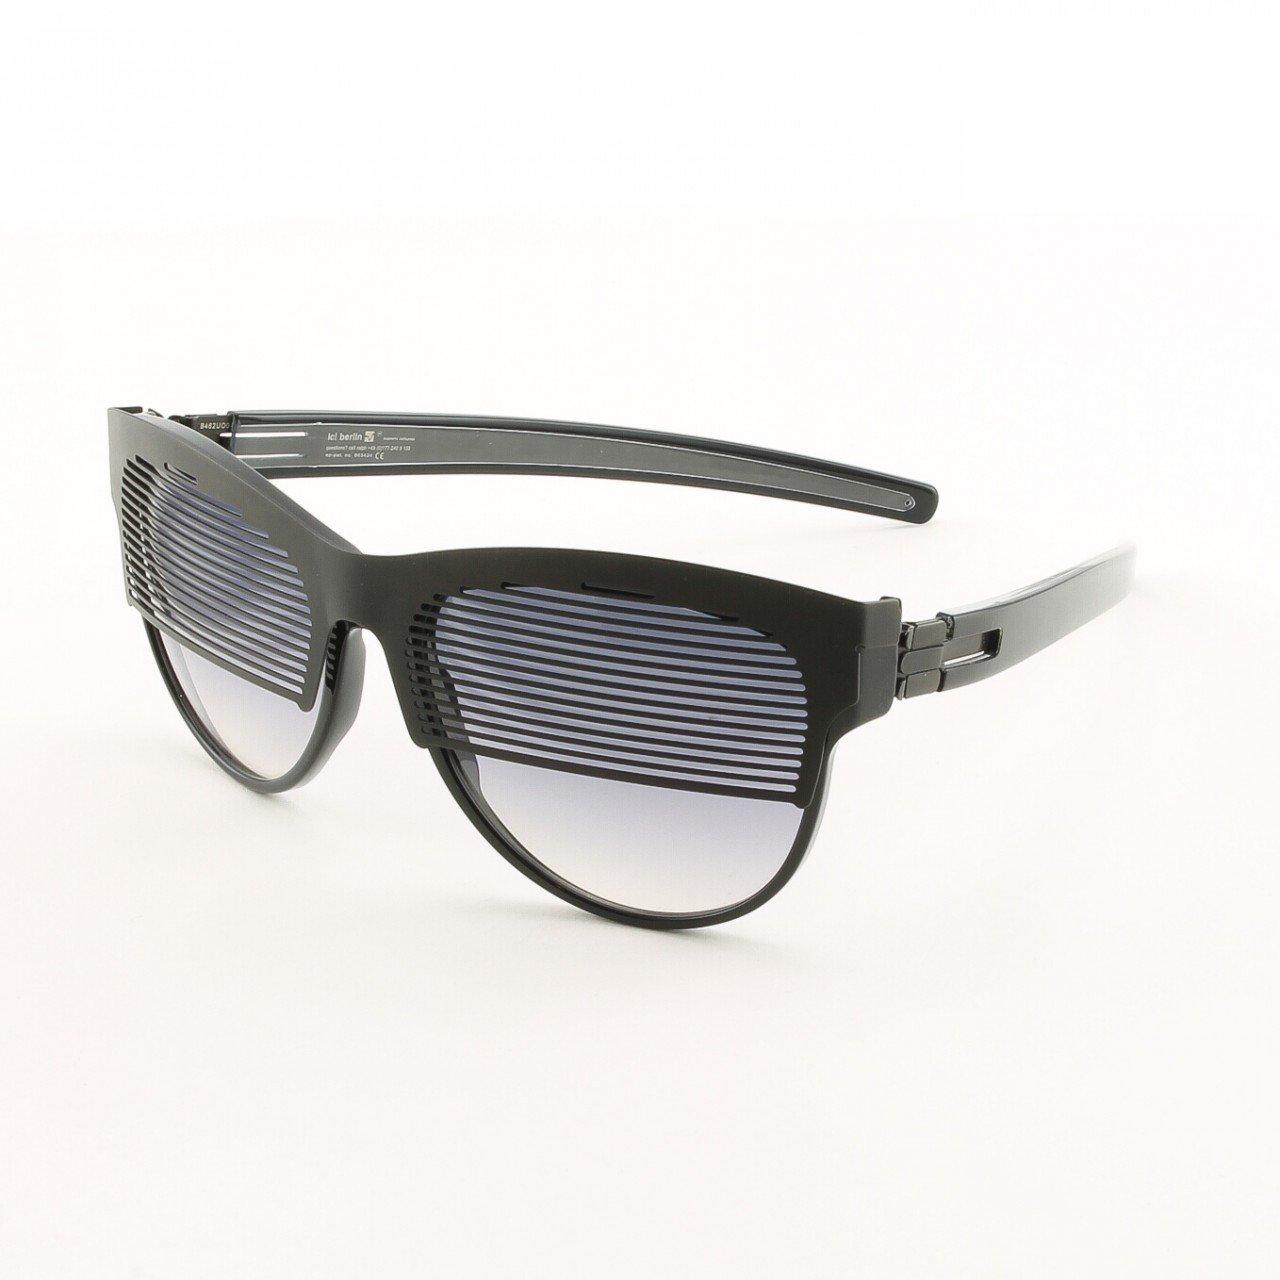 ic! Berlin Dr. Ihab Sunglasses Col. Black with Black Gradient Lenses